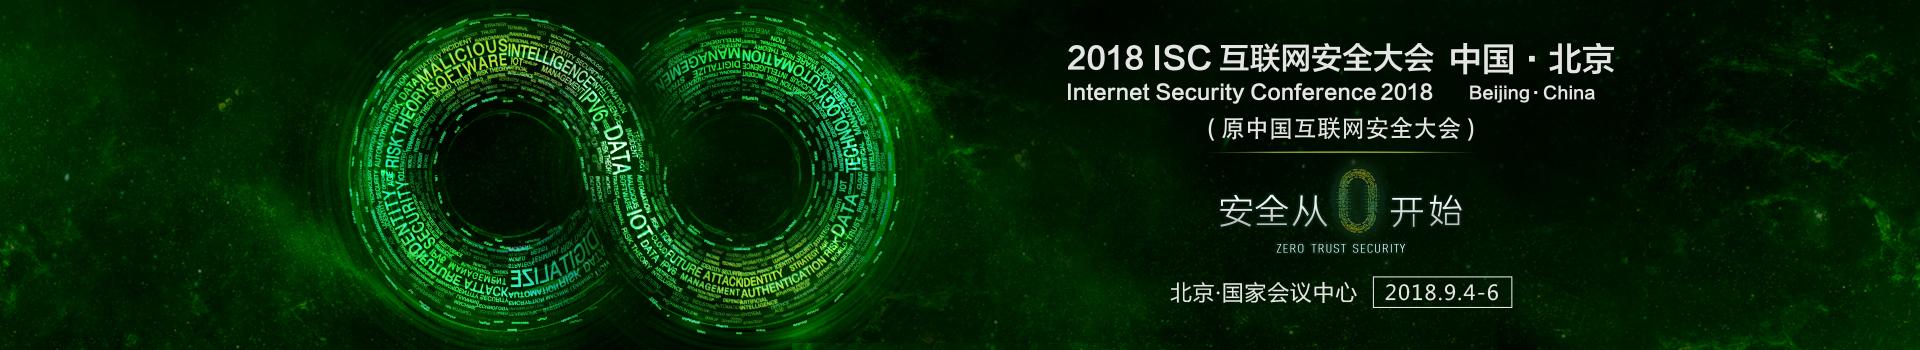 ISC2018中国互联网安全大会-安全训练营-学生票